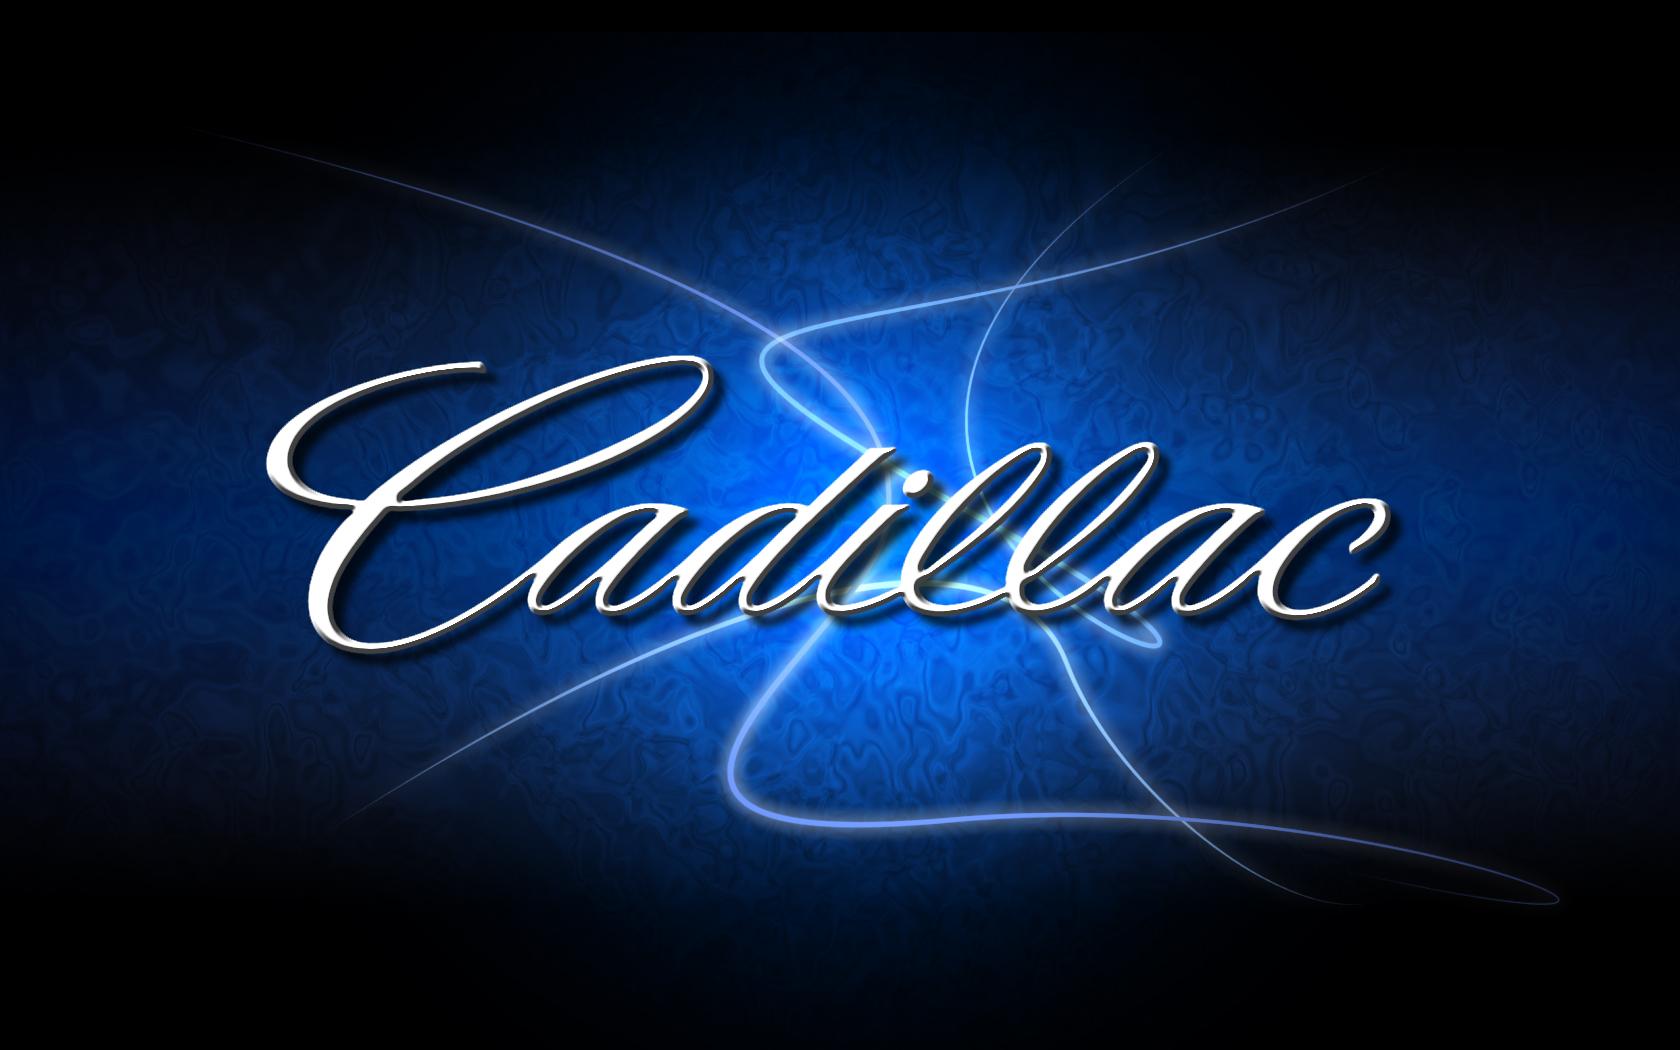 Cadillac Logo Wallpaper Wallpapersafari